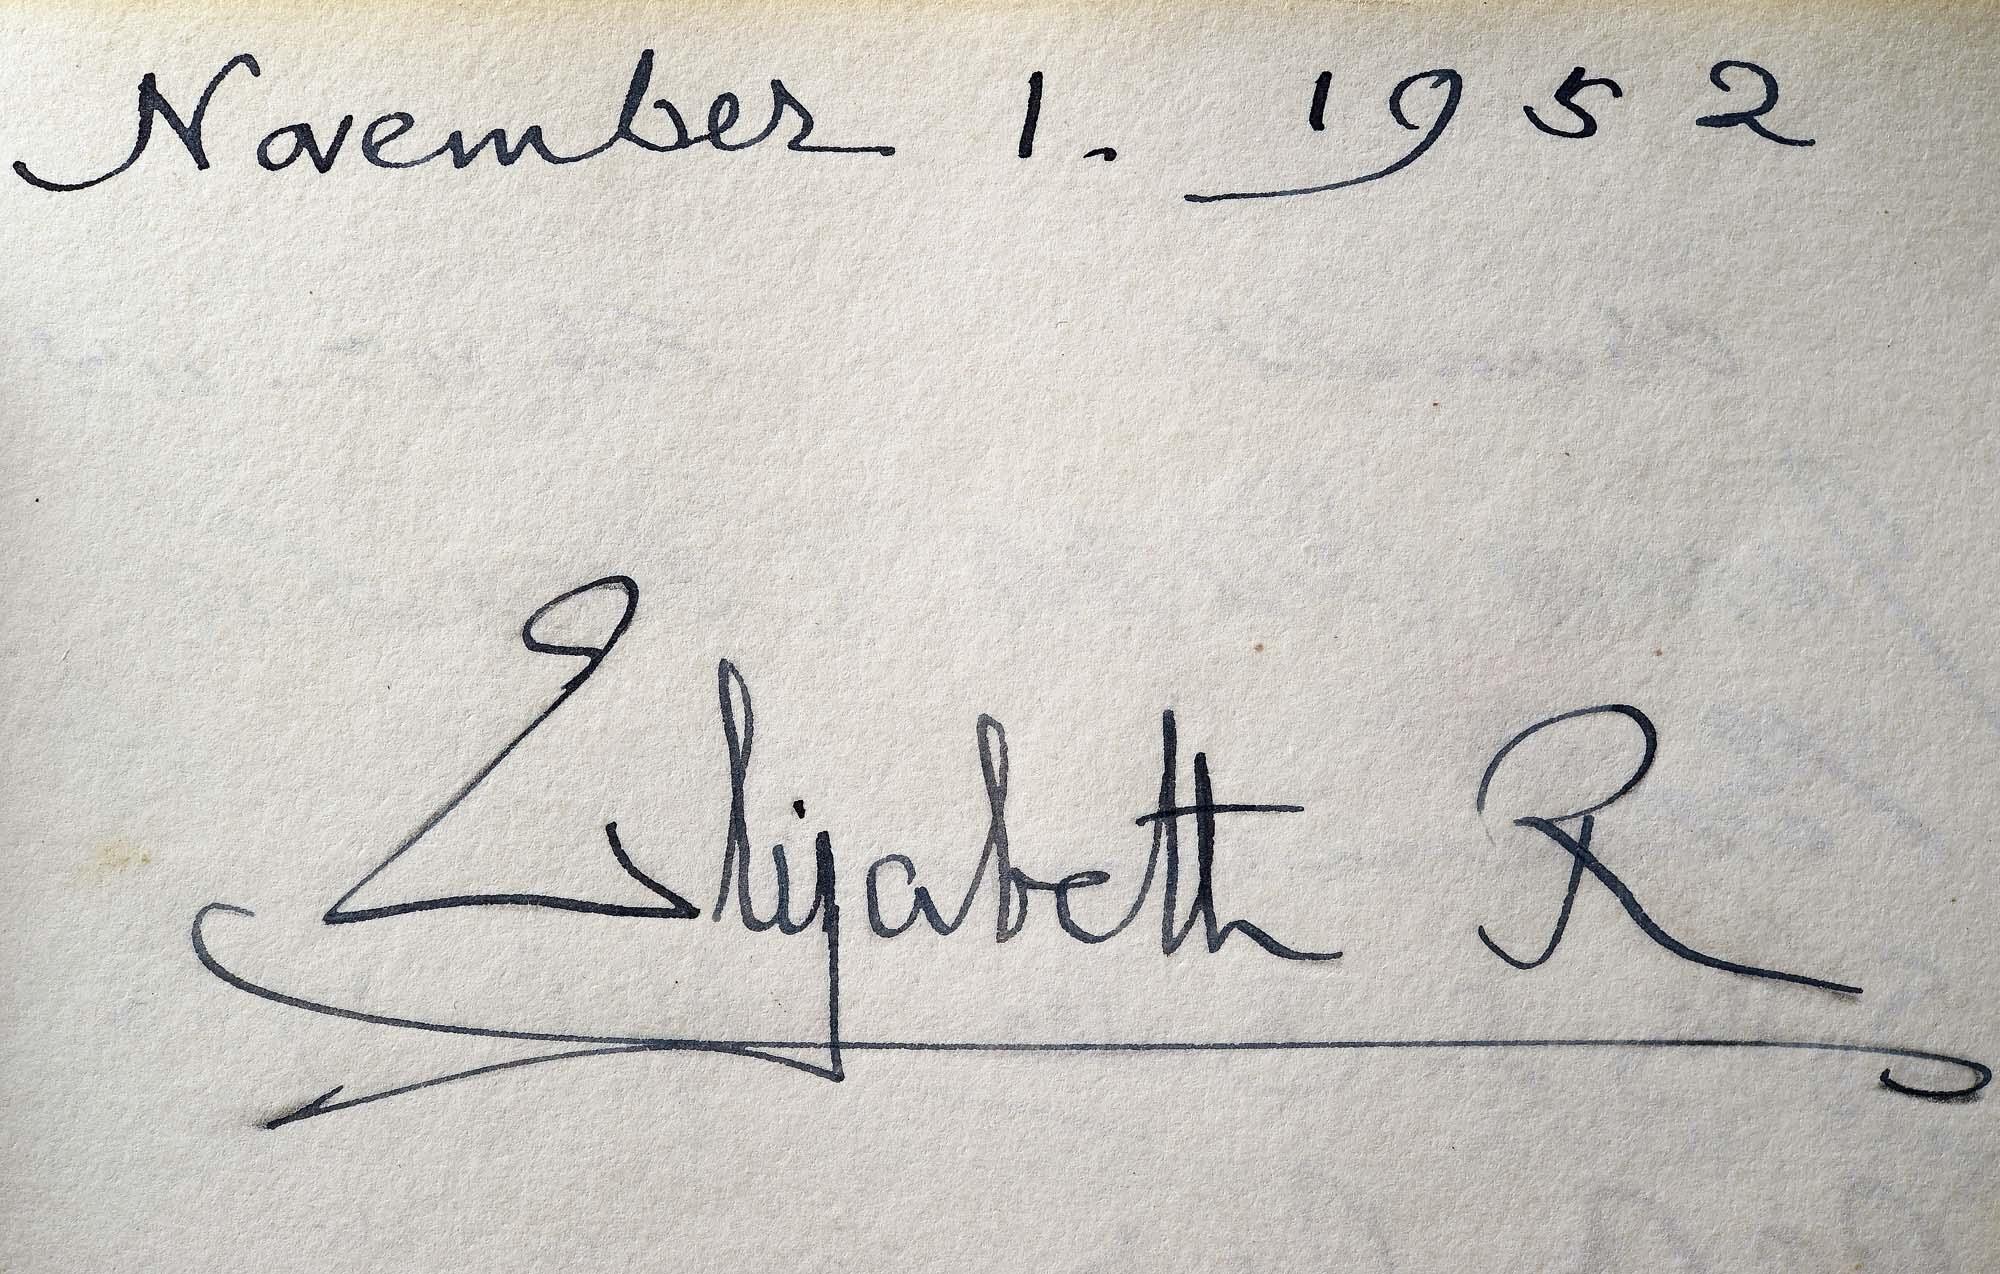 a photo of the signature Elizabeth R